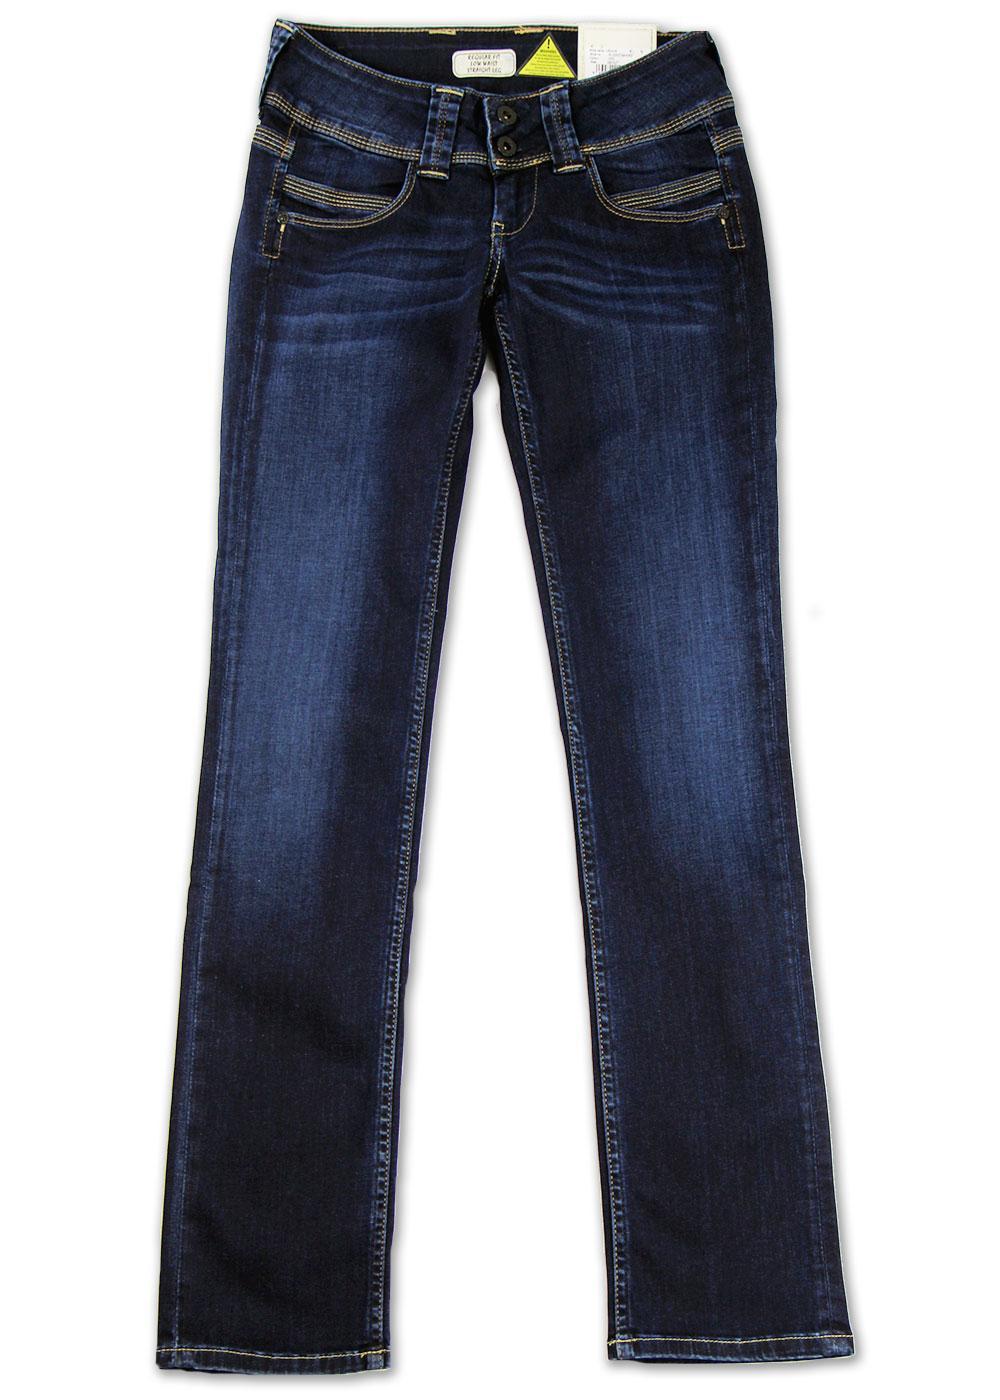 Venus Pepe Retro Indie Straight Leg Blue Jeans